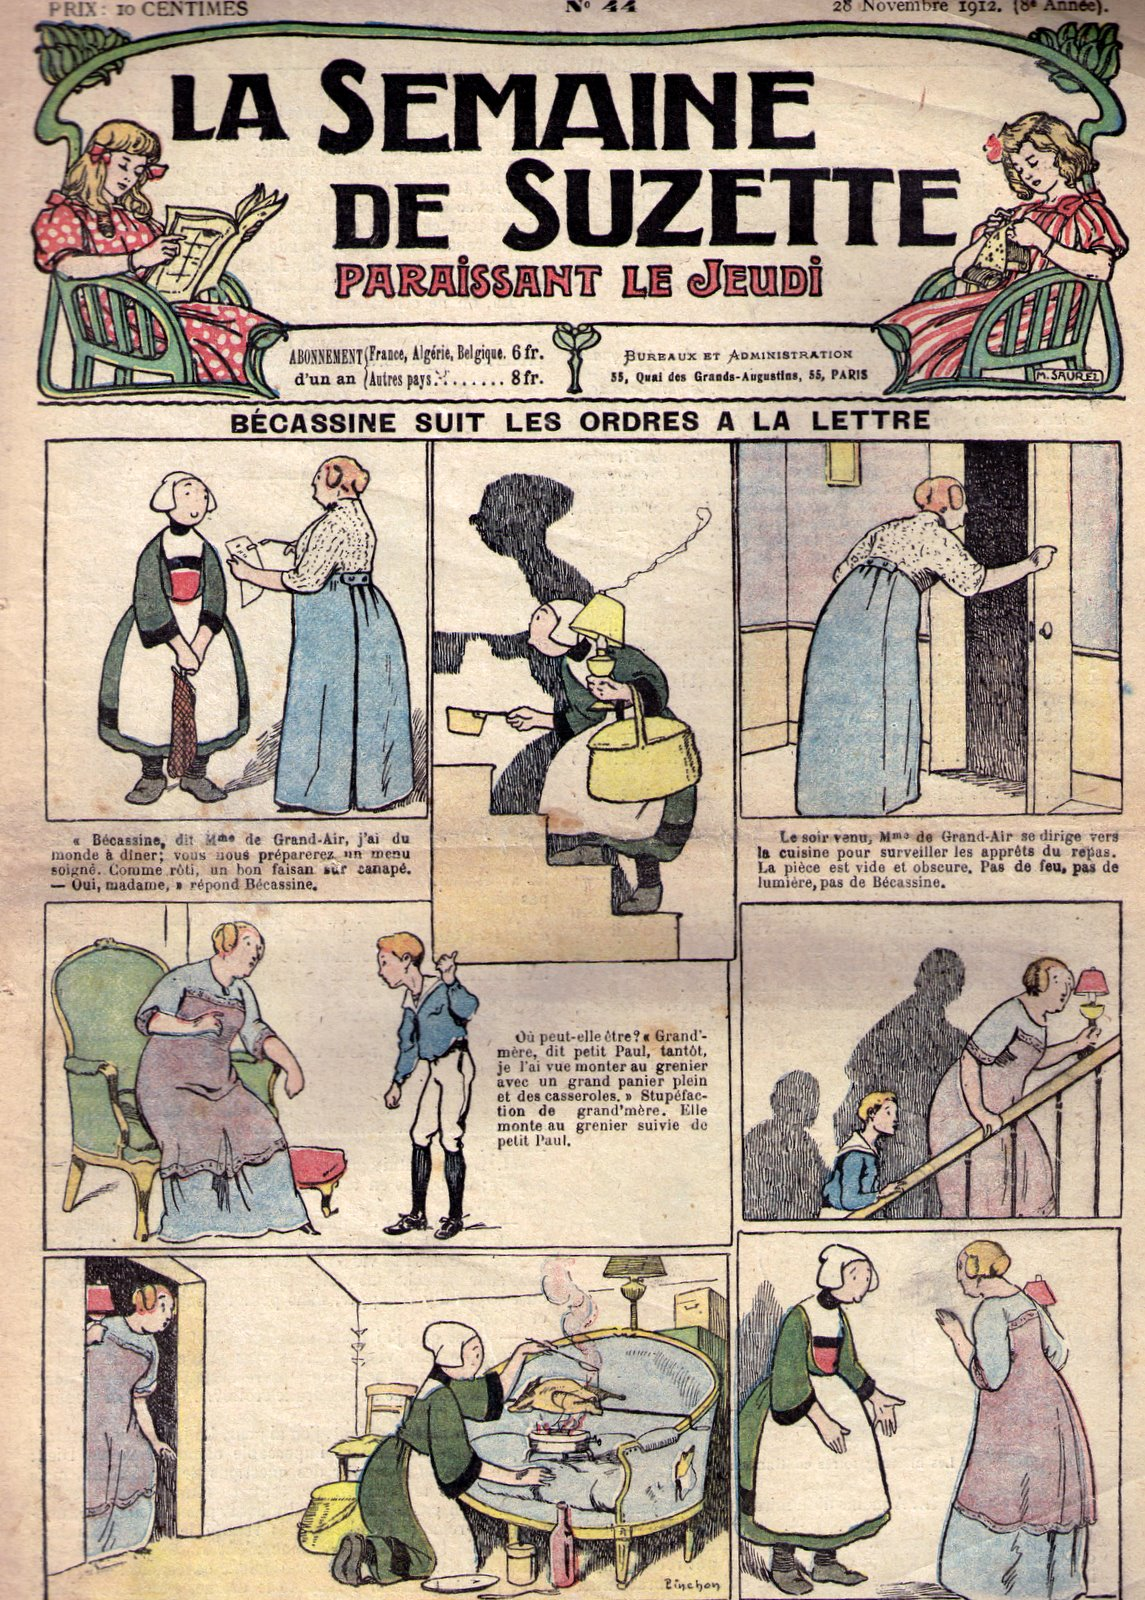 semaine-de-suzette-novembre-1912